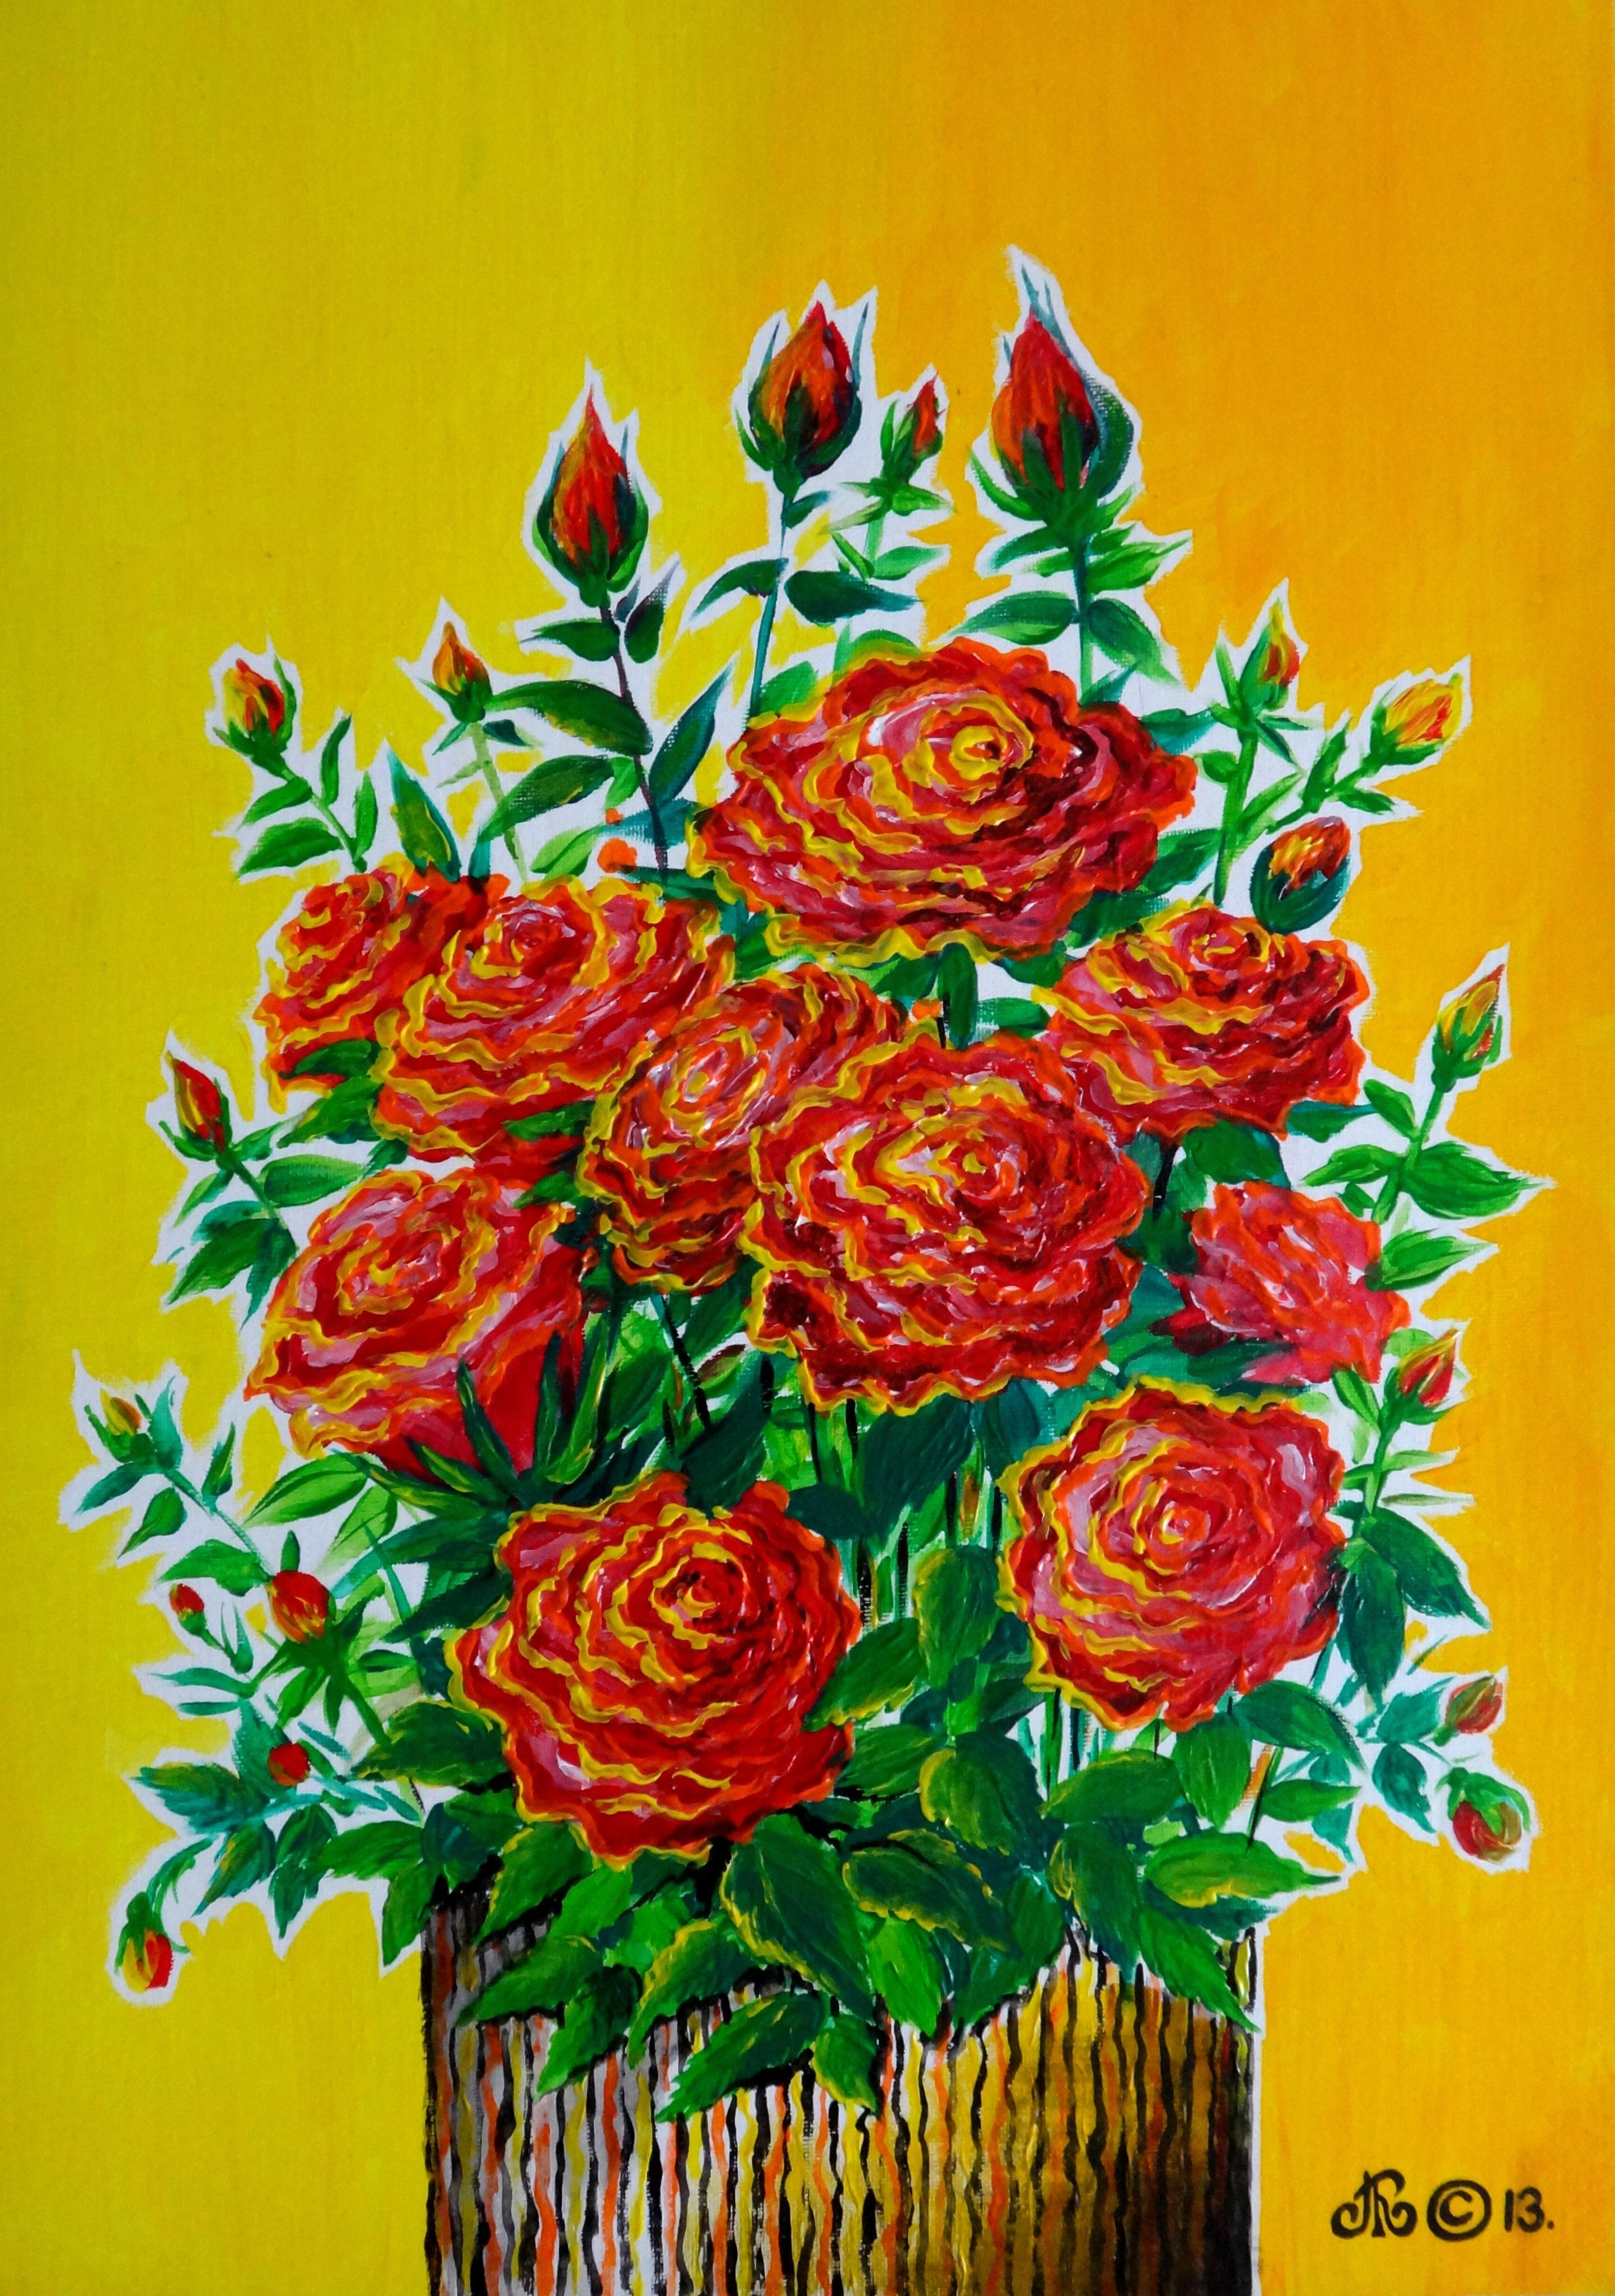 розы на жёлтом , акрил, холст на картоне, 35х50 см.